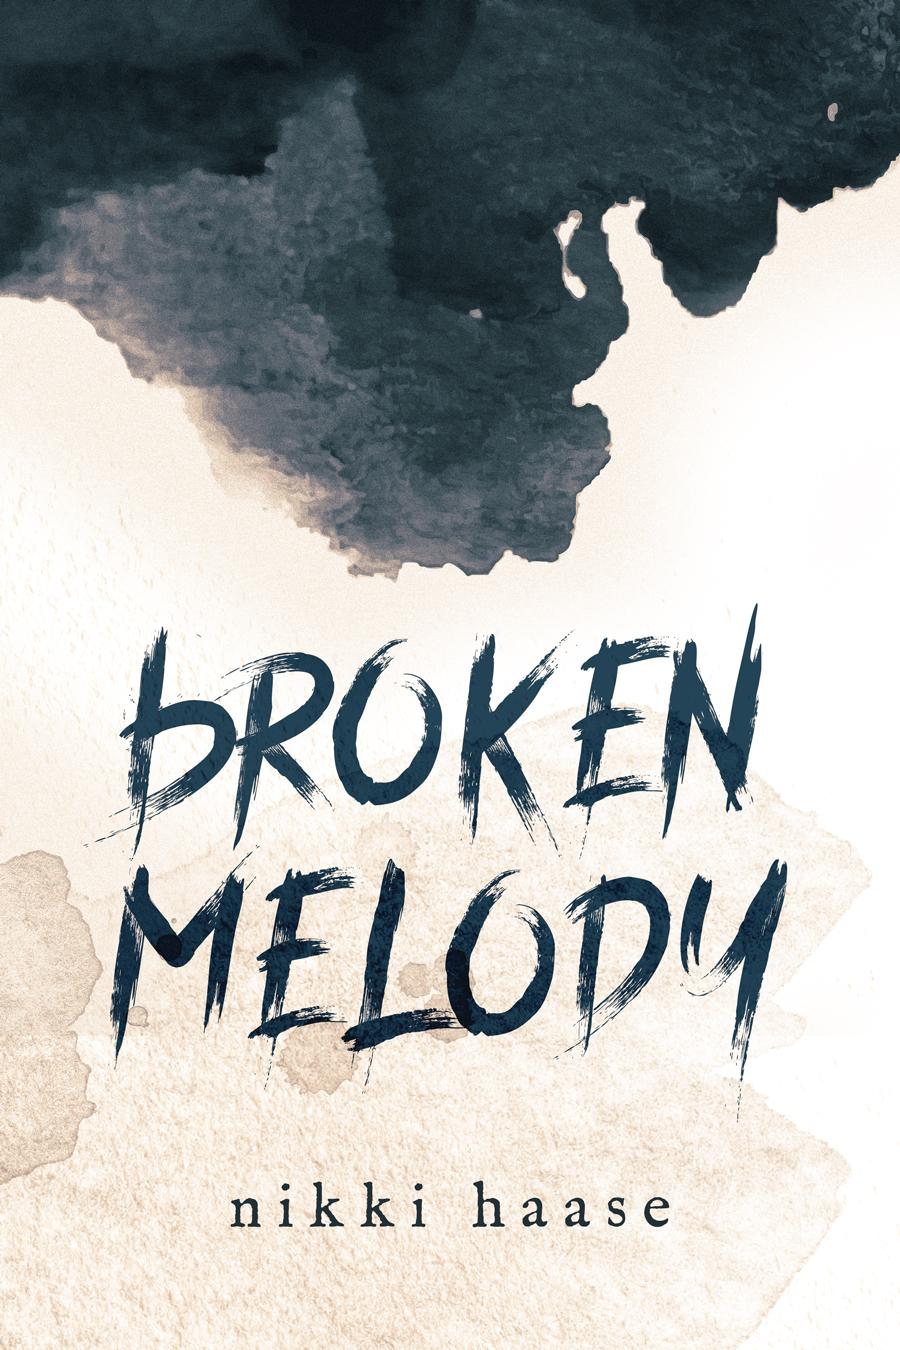 BrokenMelody-f900-web